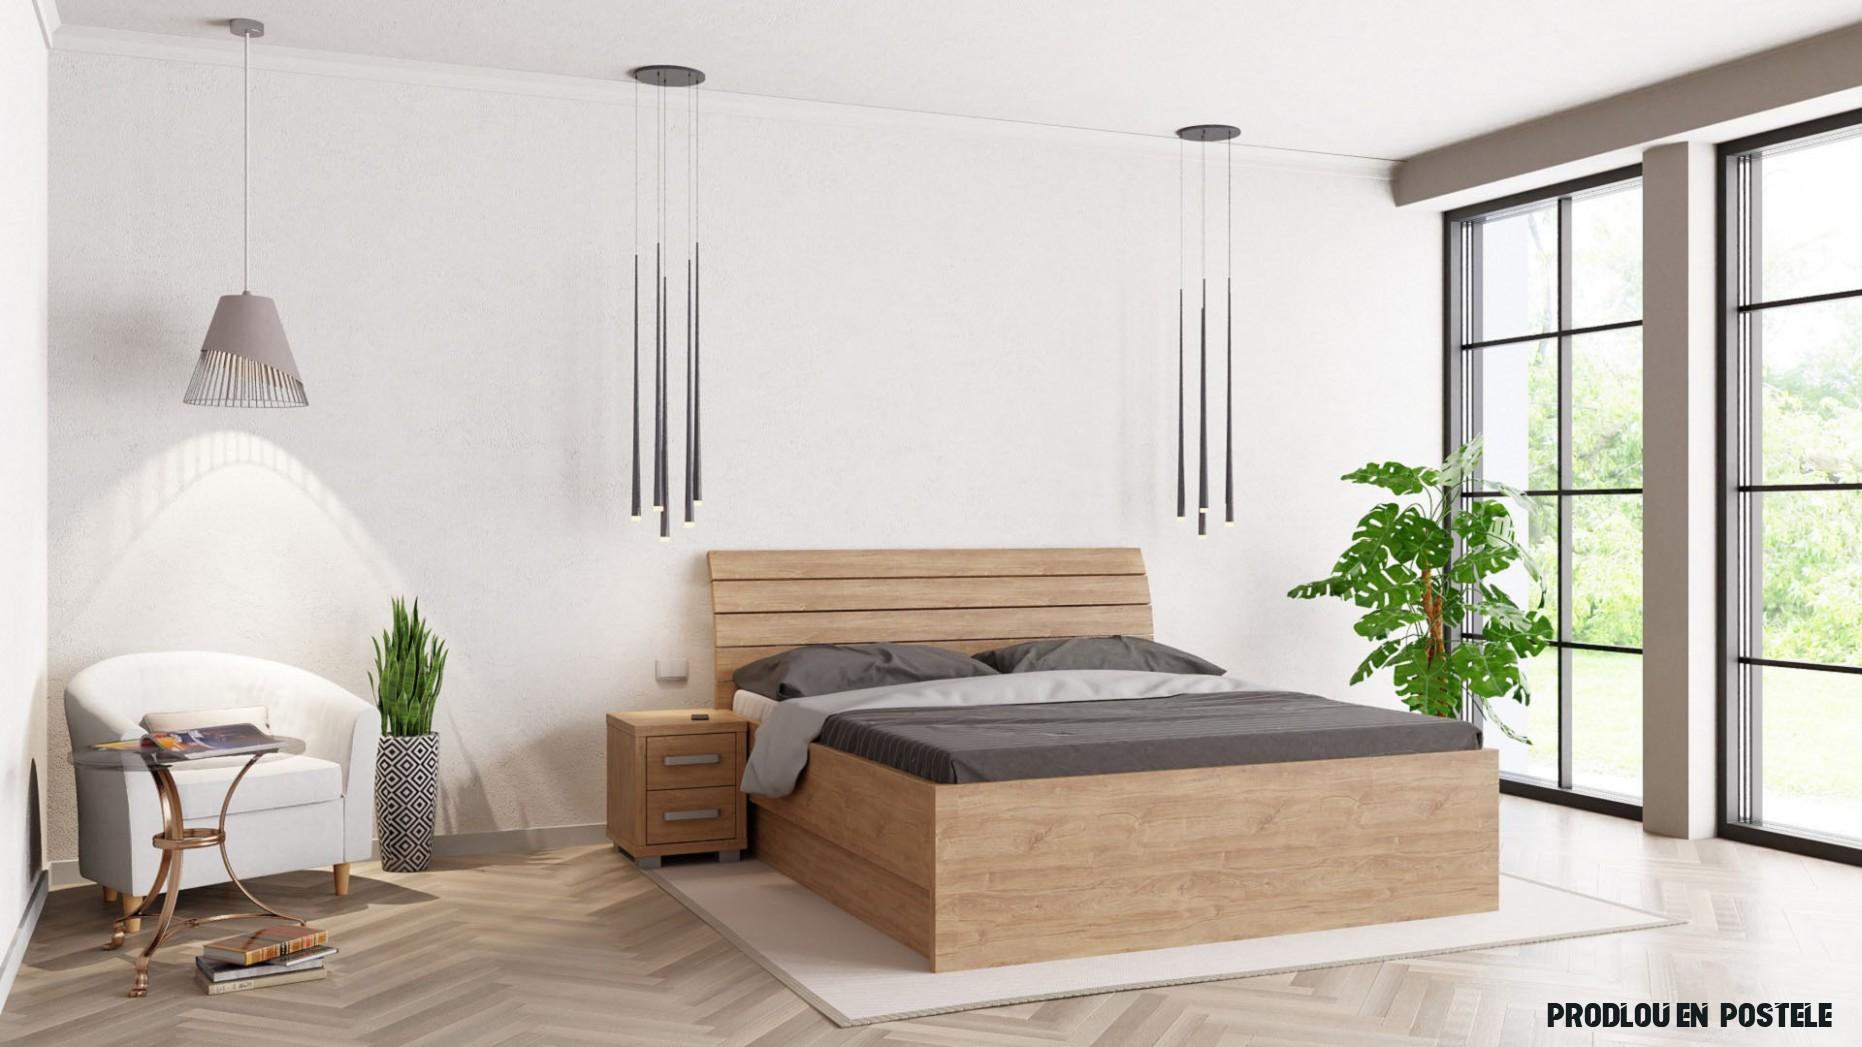 Notaxo postele lamino - JMP Studio zdravého spaní